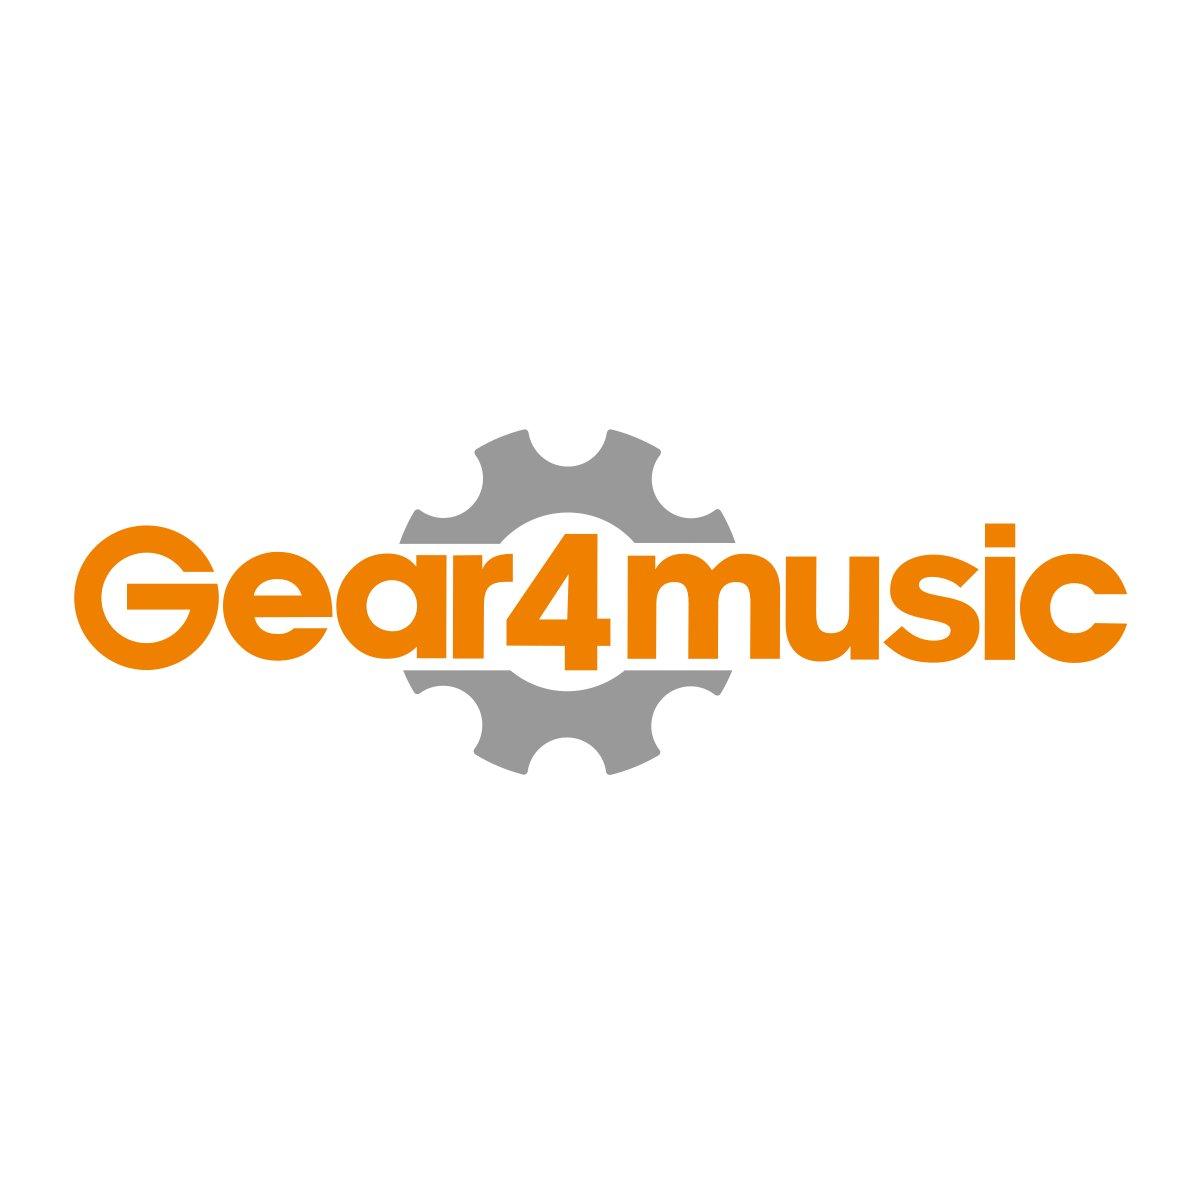 Basso Elettroacustico a 5 corde Gear4music